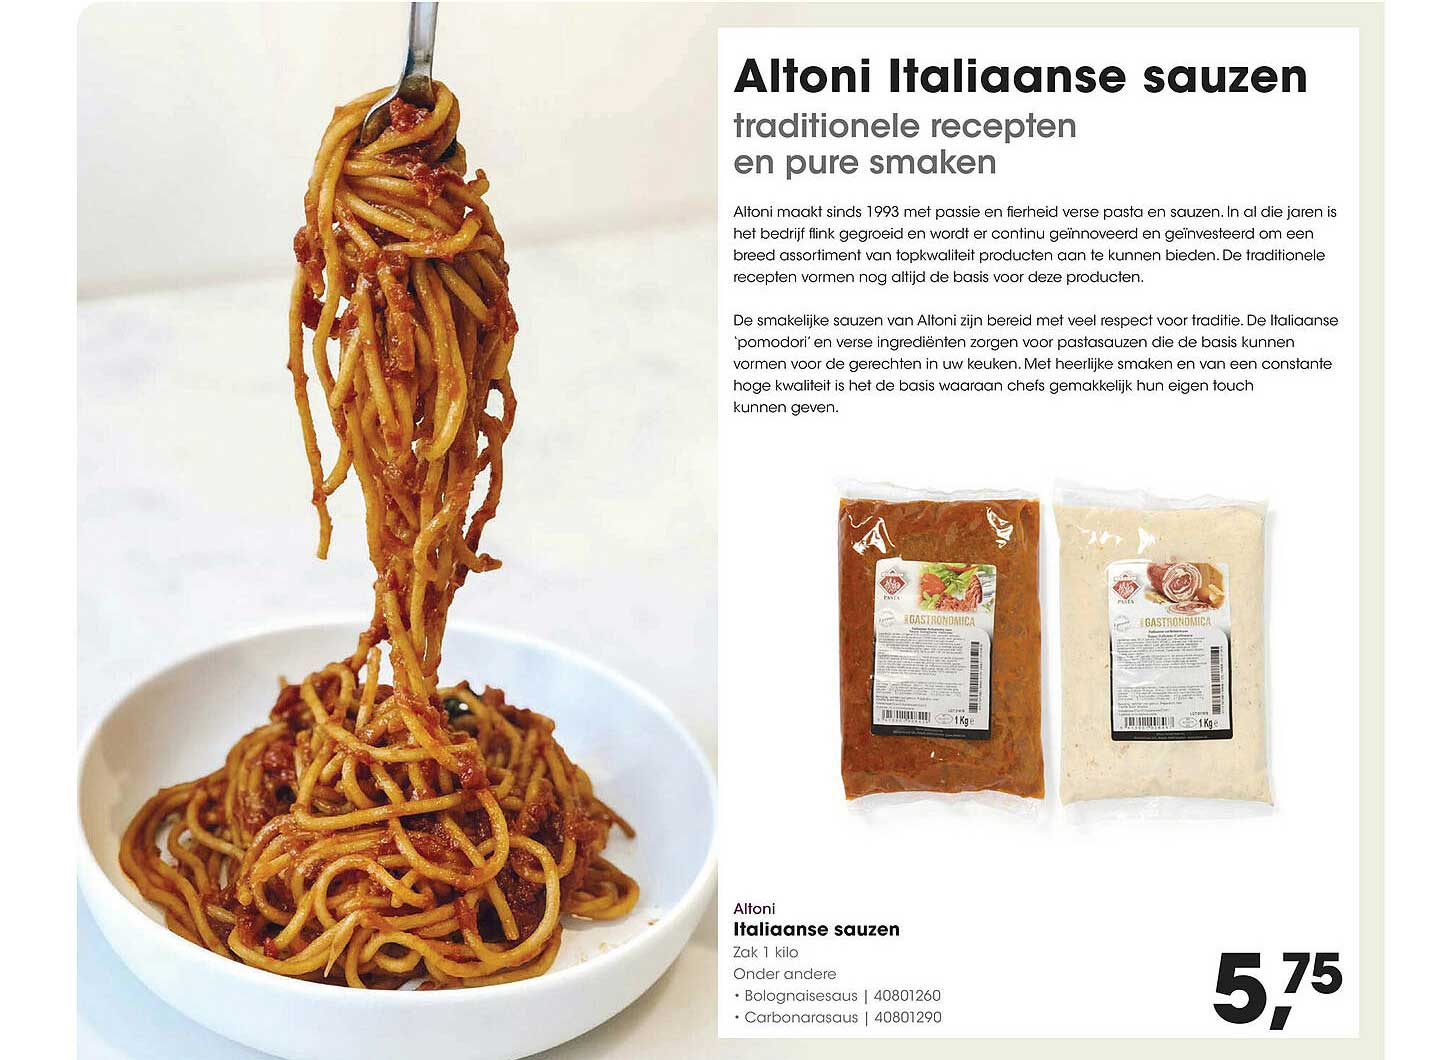 HANOS Altoni Italiaanse Sauzen Bolognaisesaus Of Carbonarasaus